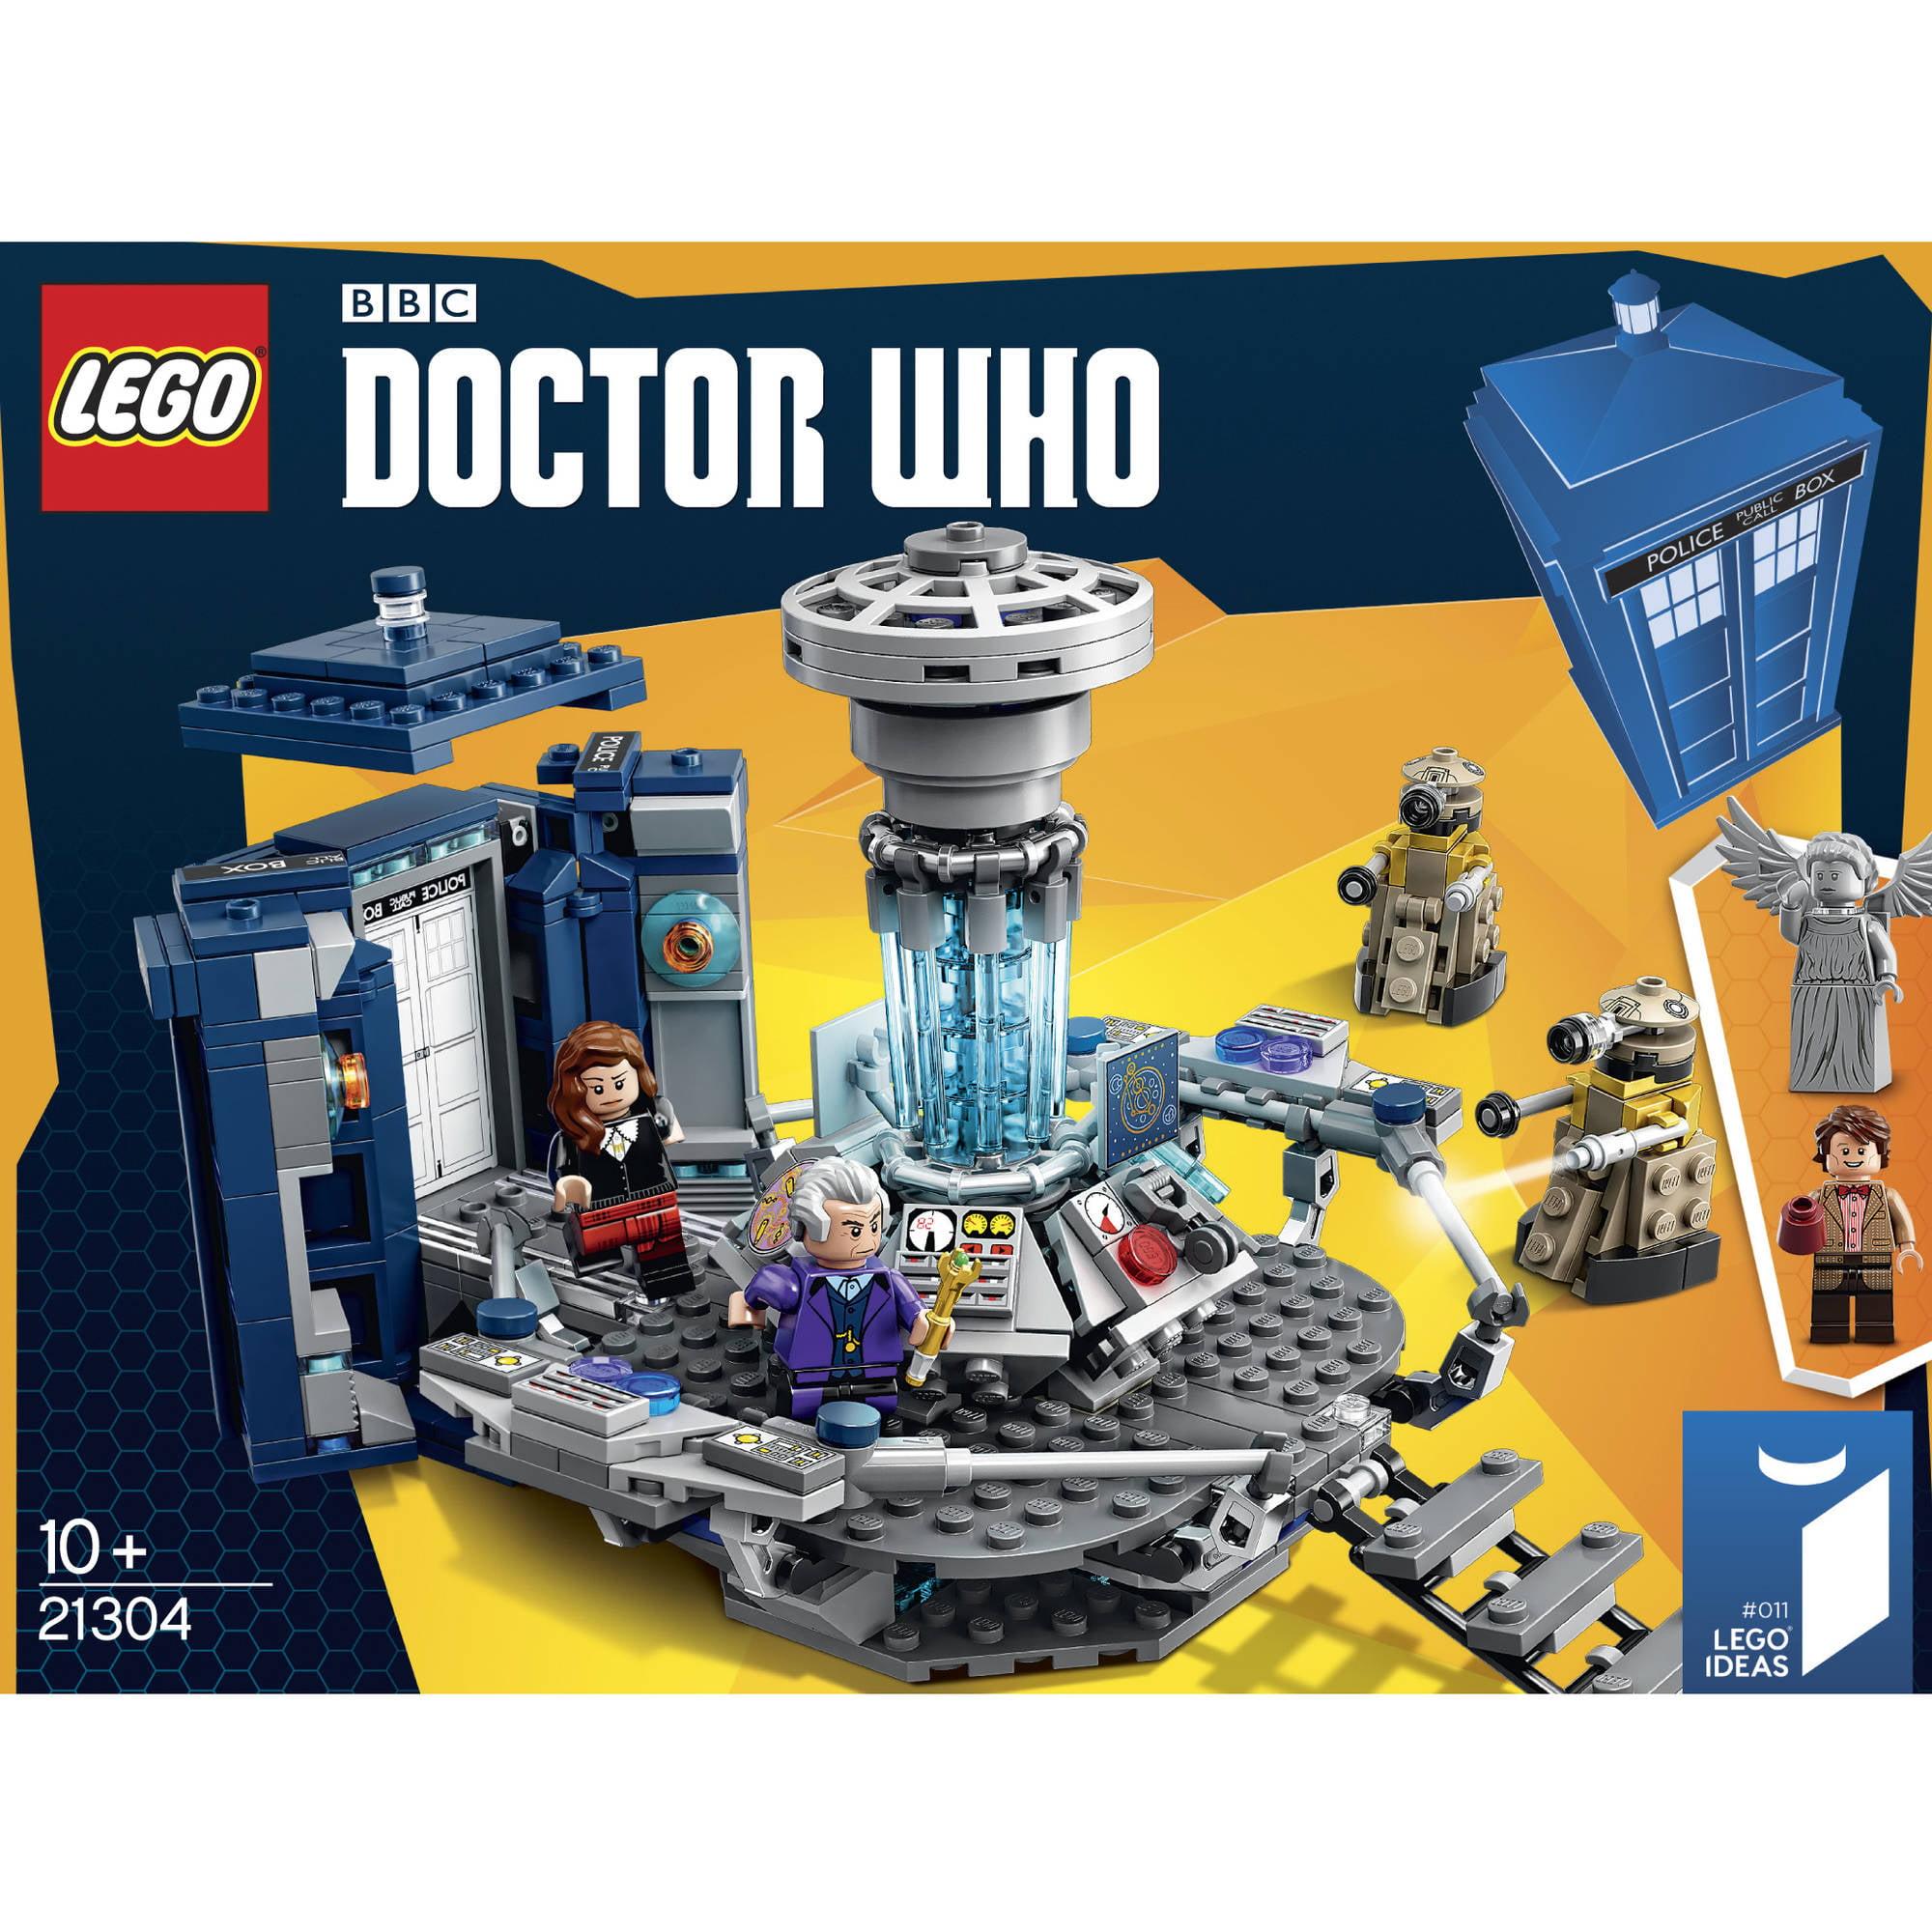 sc 1 st  Walmart & LEGO Doctor Who TARDIS Set 21304 - Walmart.com